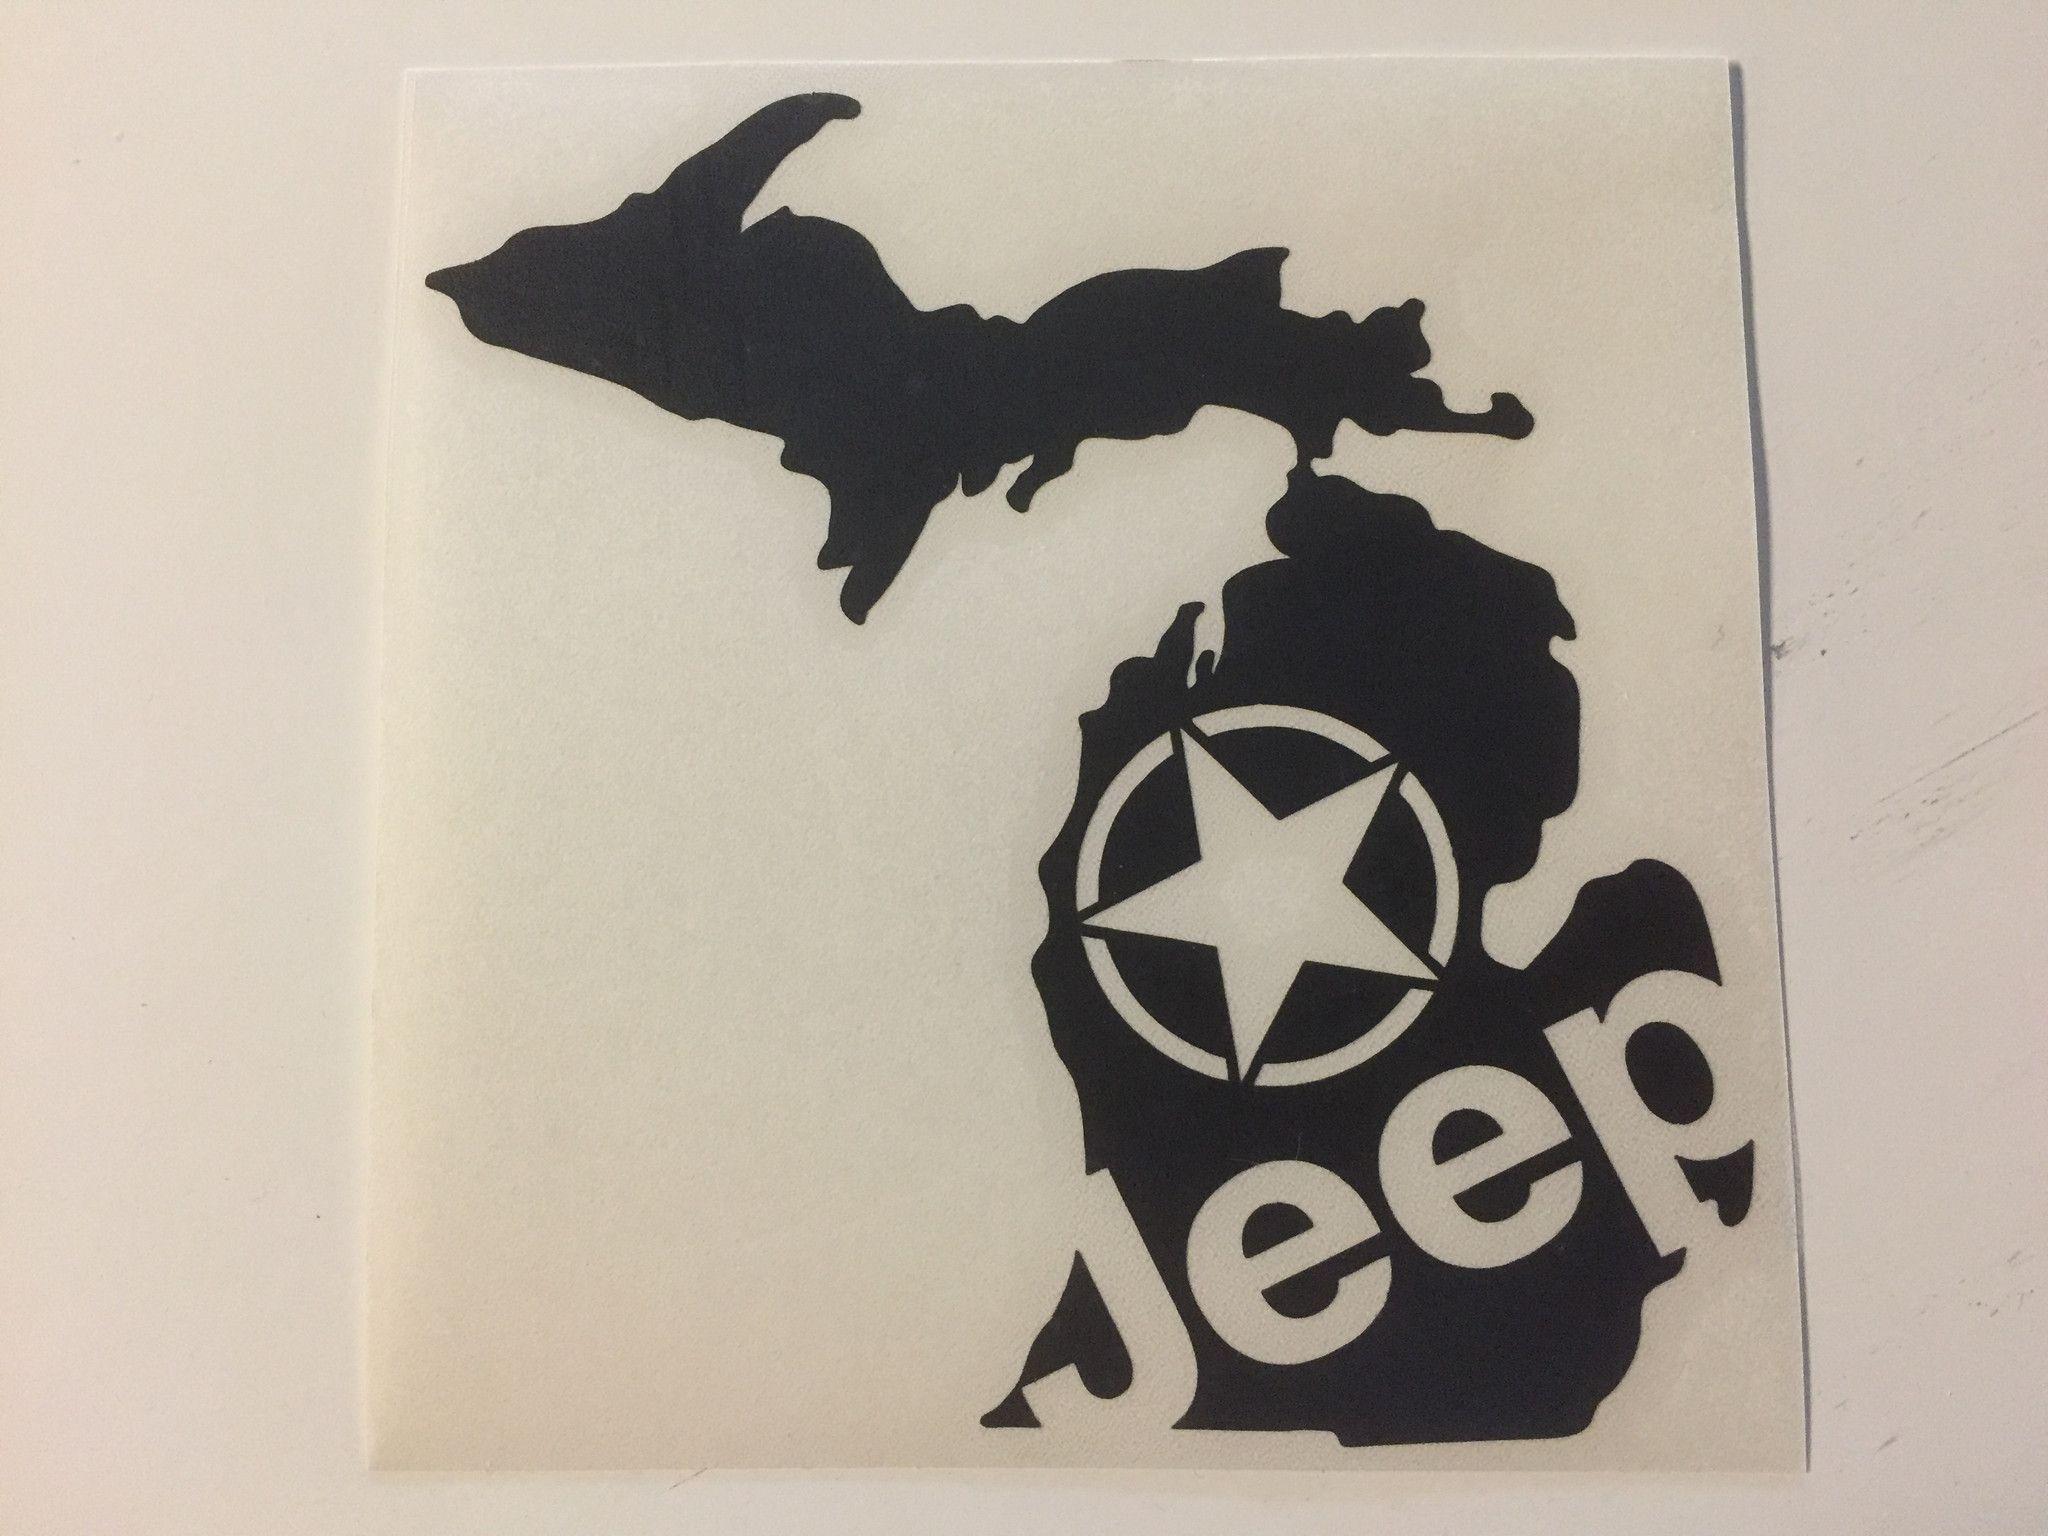 Cities Of Michigan Vinyl Car Decal Sticker Free Shipping Car Decals Michigan Decal Car Decals Vinyl [ 1460 x 1500 Pixel ]